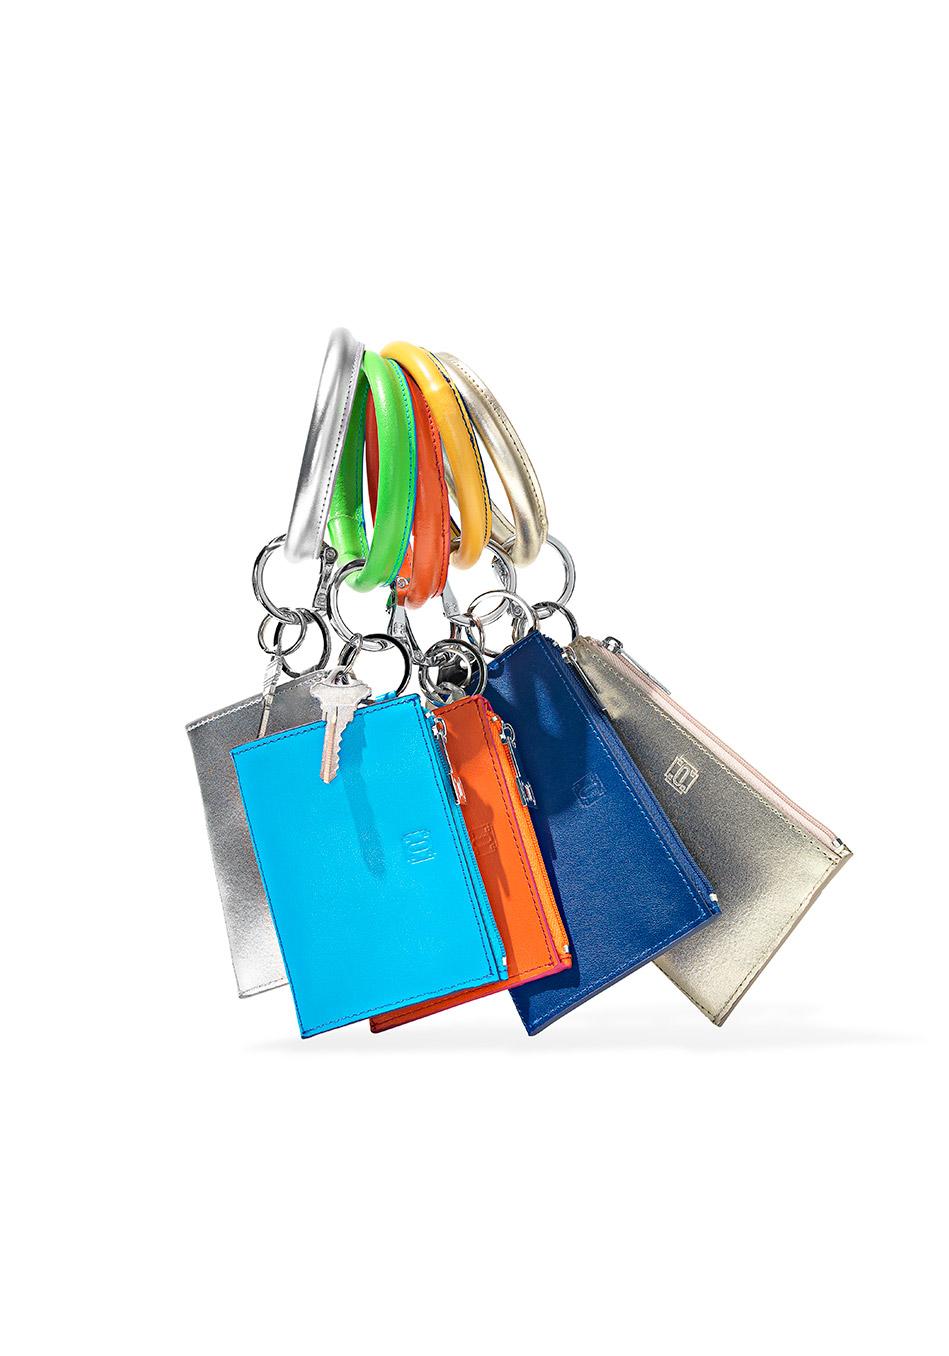 Oprahs Favorite Things 2014  Big O Key Rings and Card Cases